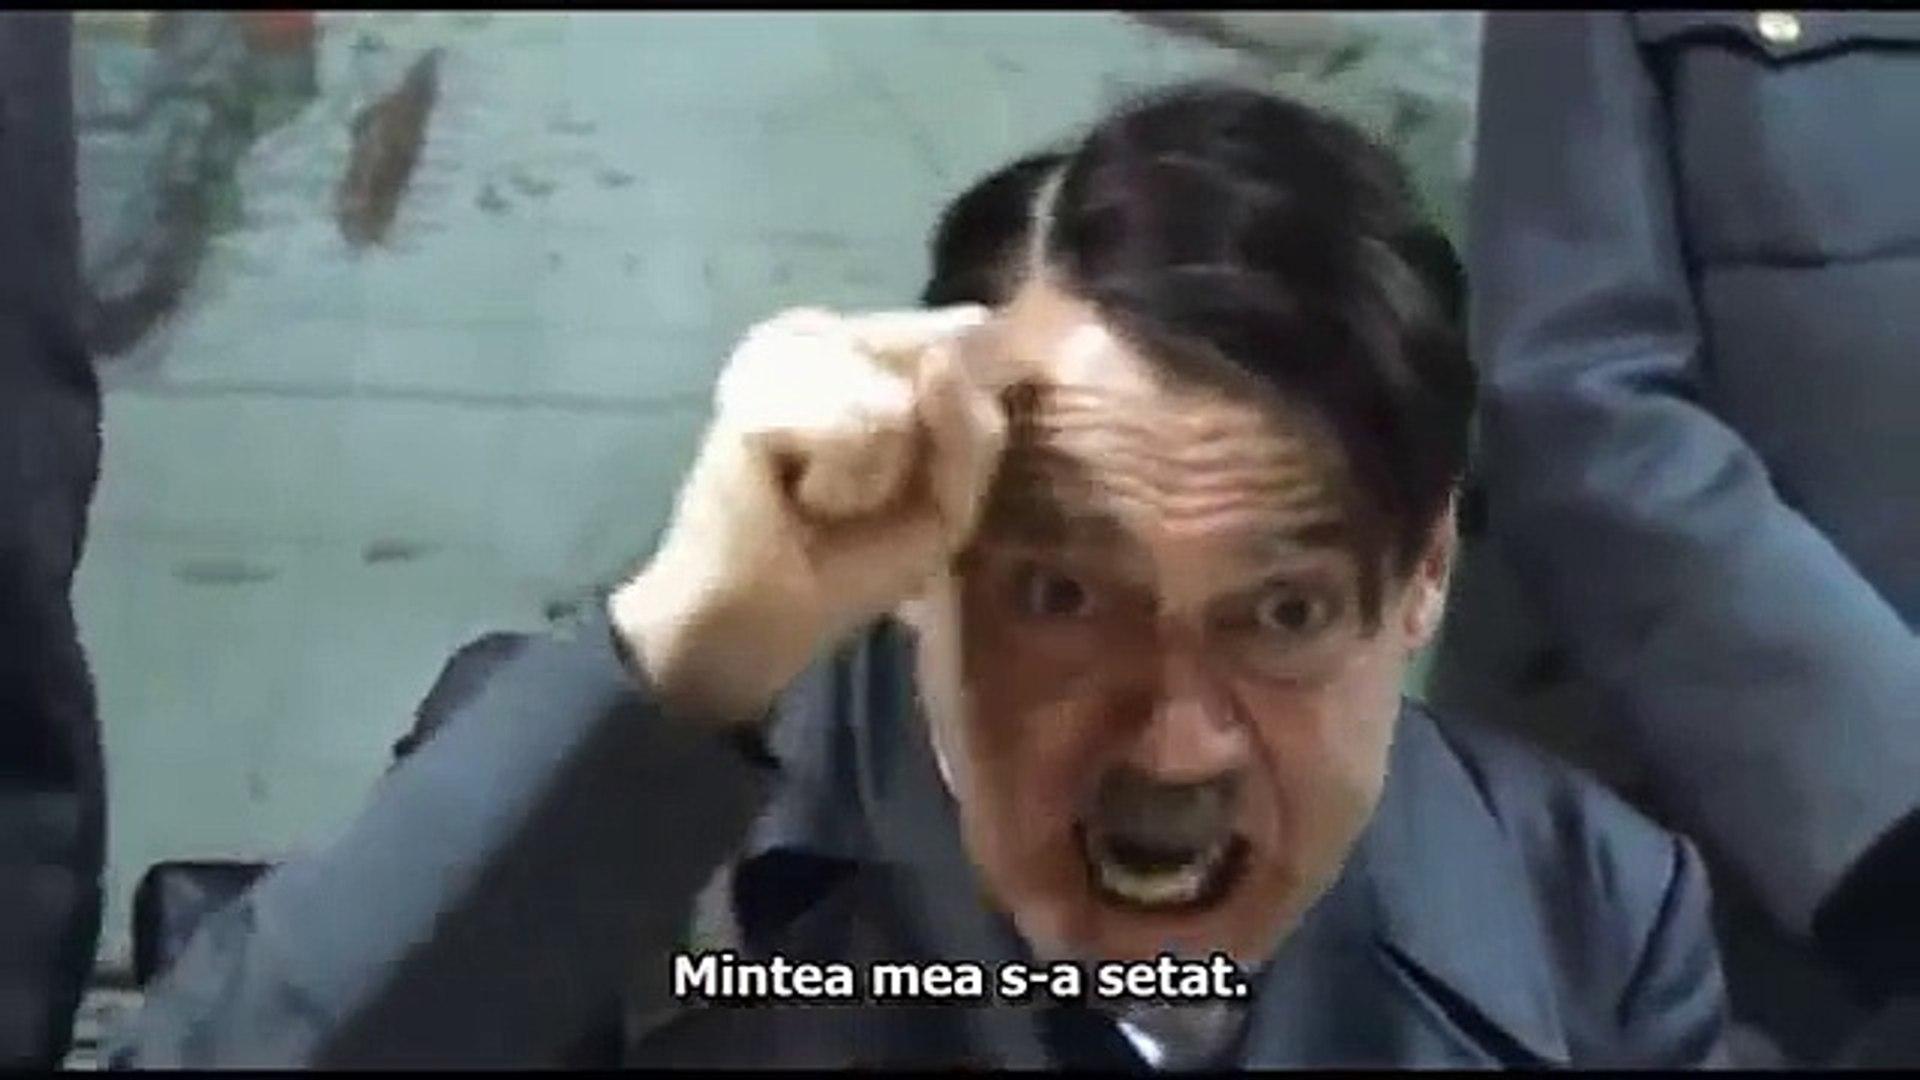 Otaku Parodies V1 - Hitler's Music Video